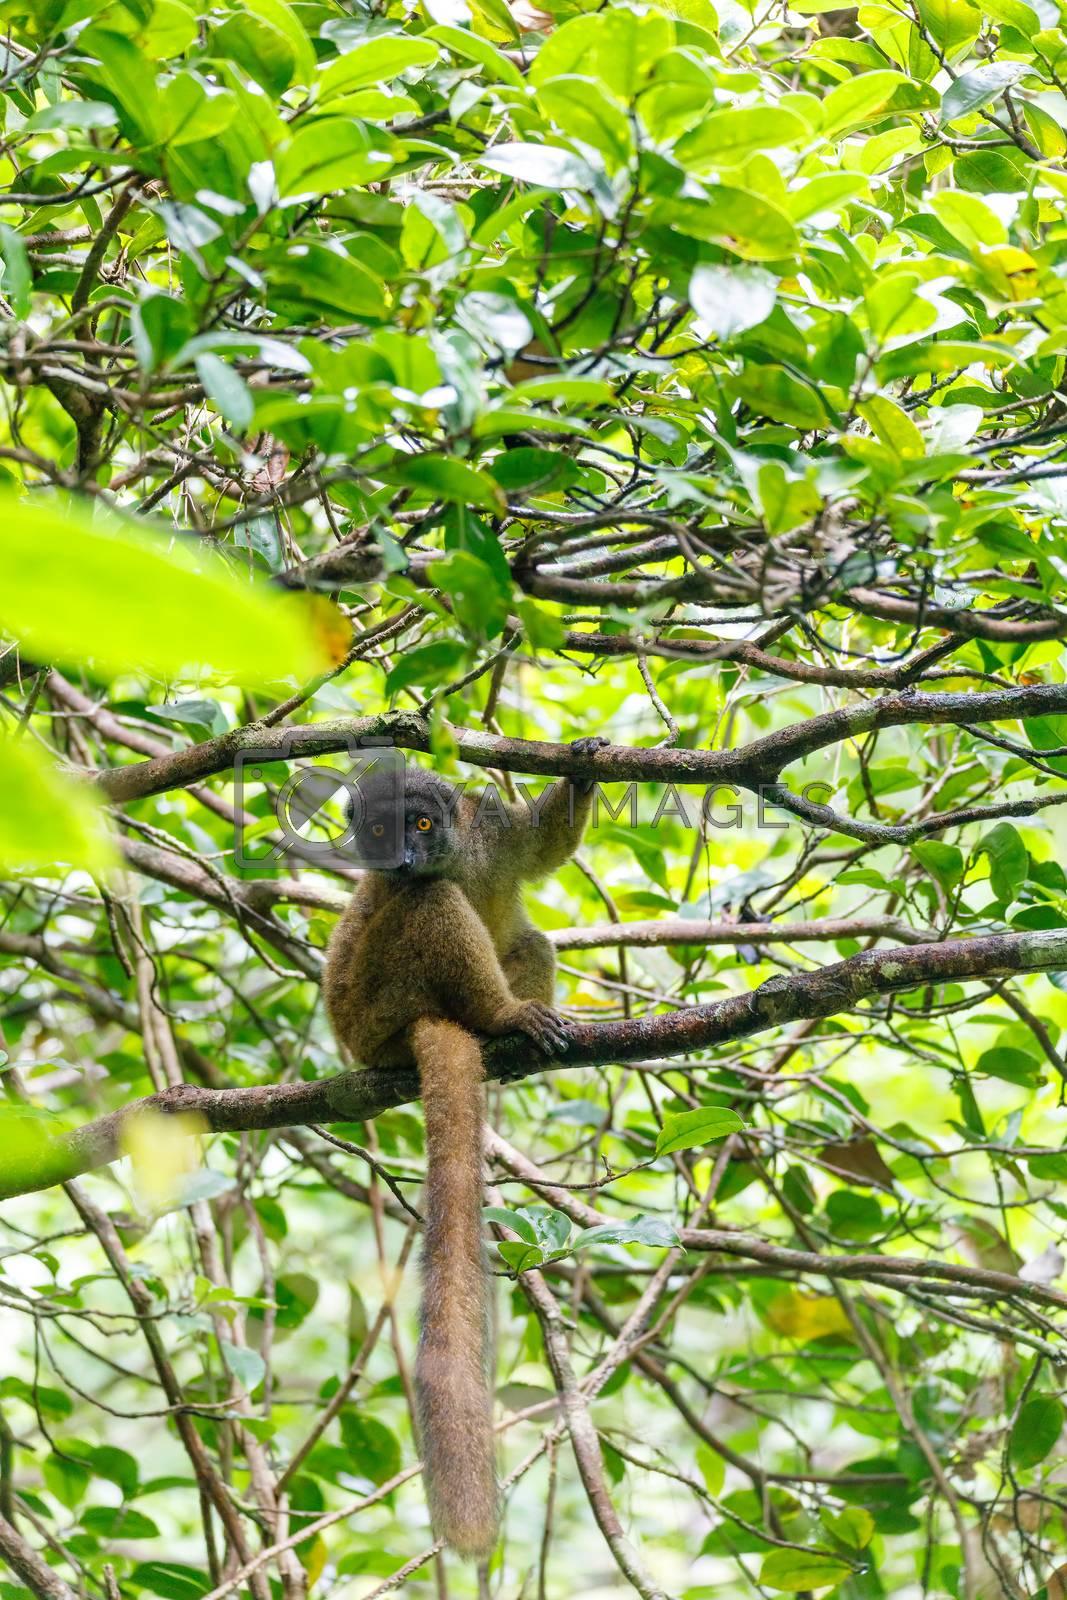 female of white-headed lemur (Eulemur albifrons) on branch in Madagascar rainforest. Masoala forest reserve. Madagascar wildlife and wilderness